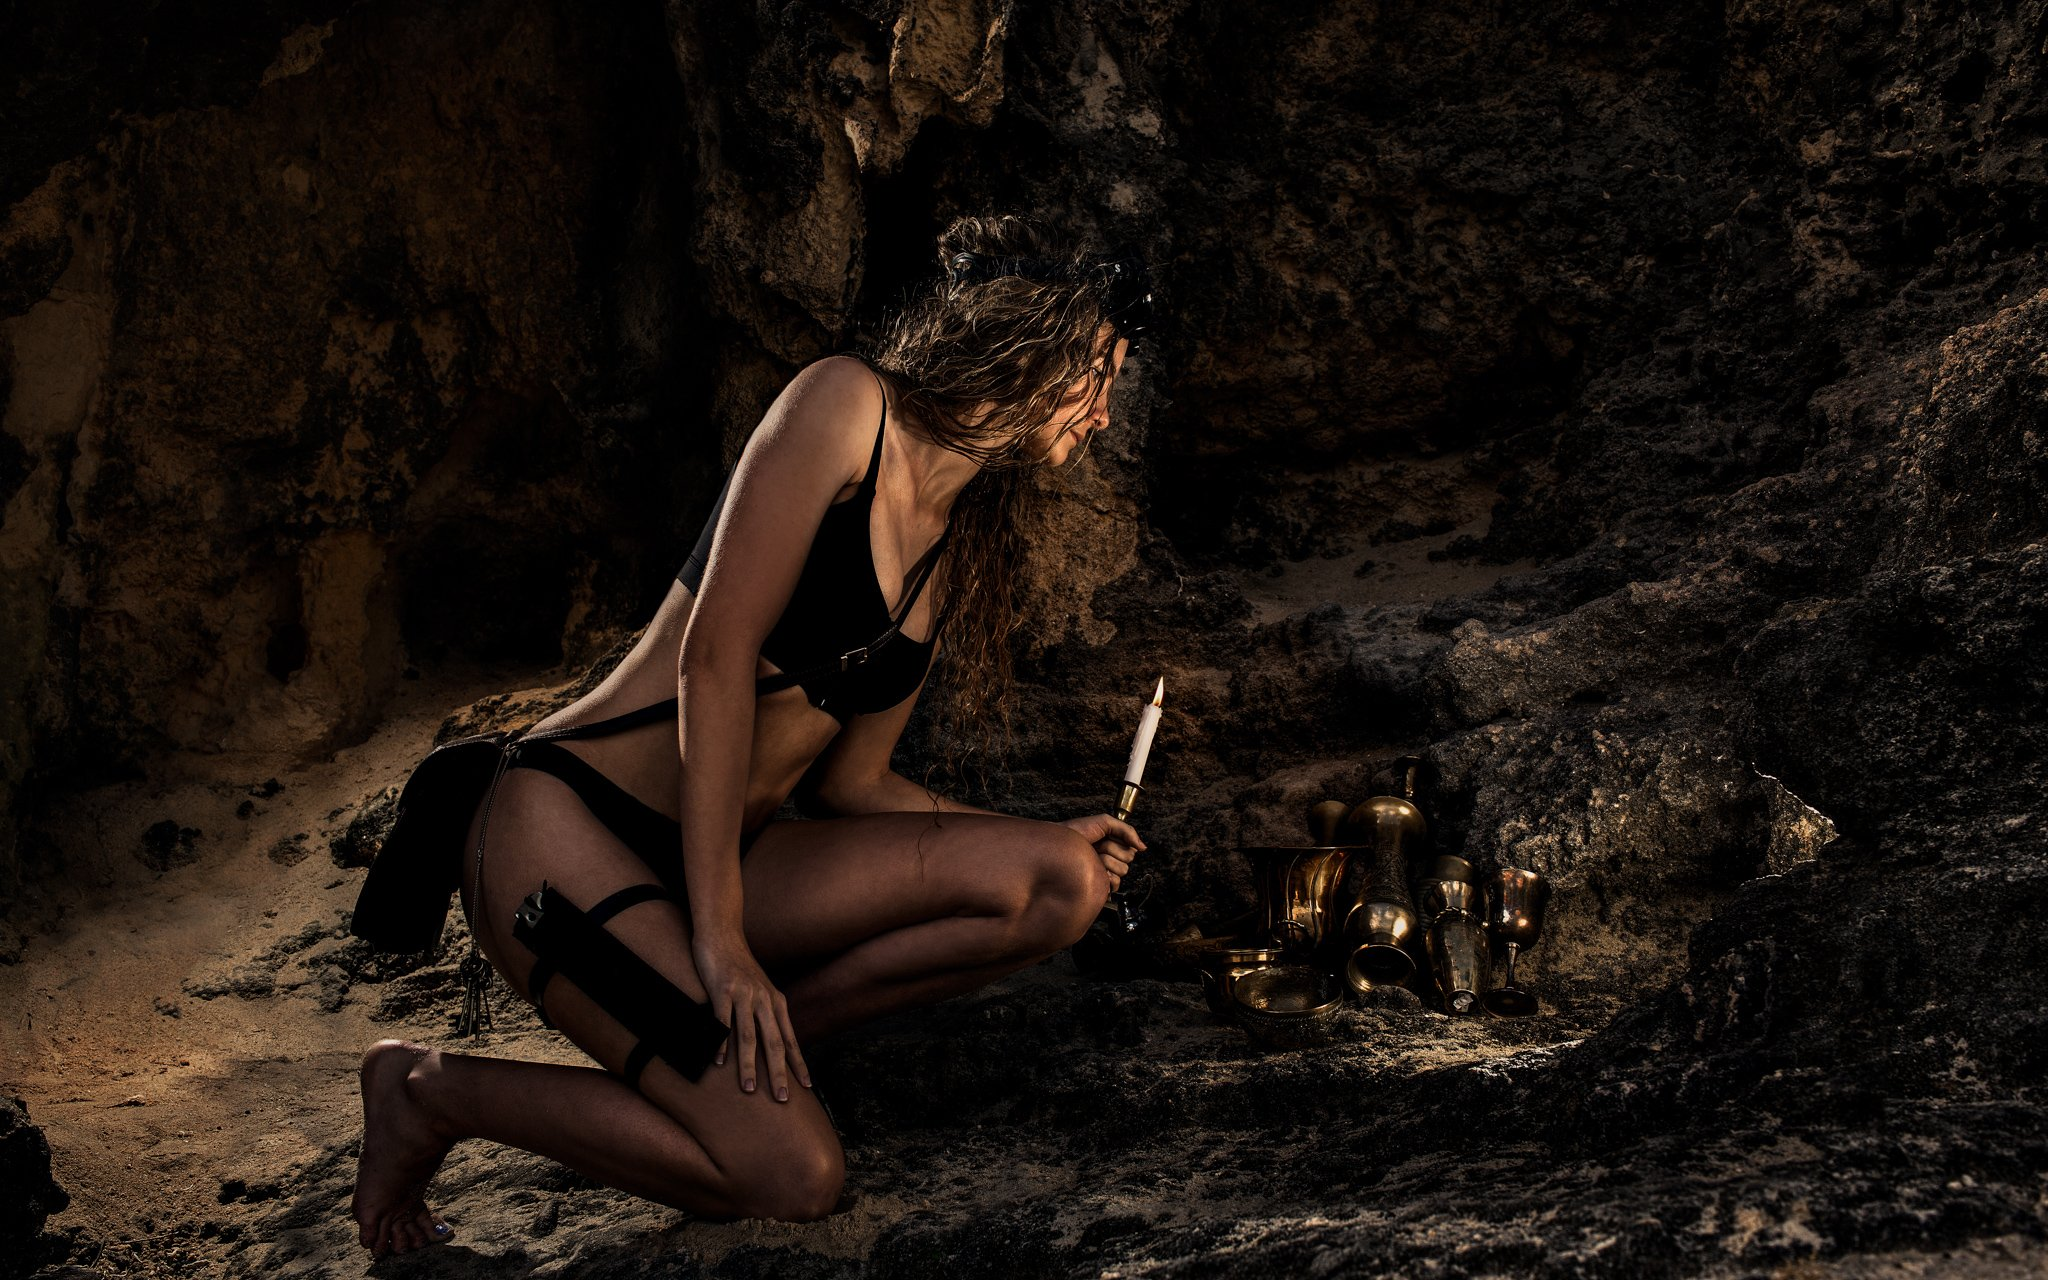 Adventure Girl – 4 – Stefanie Buma Photographer